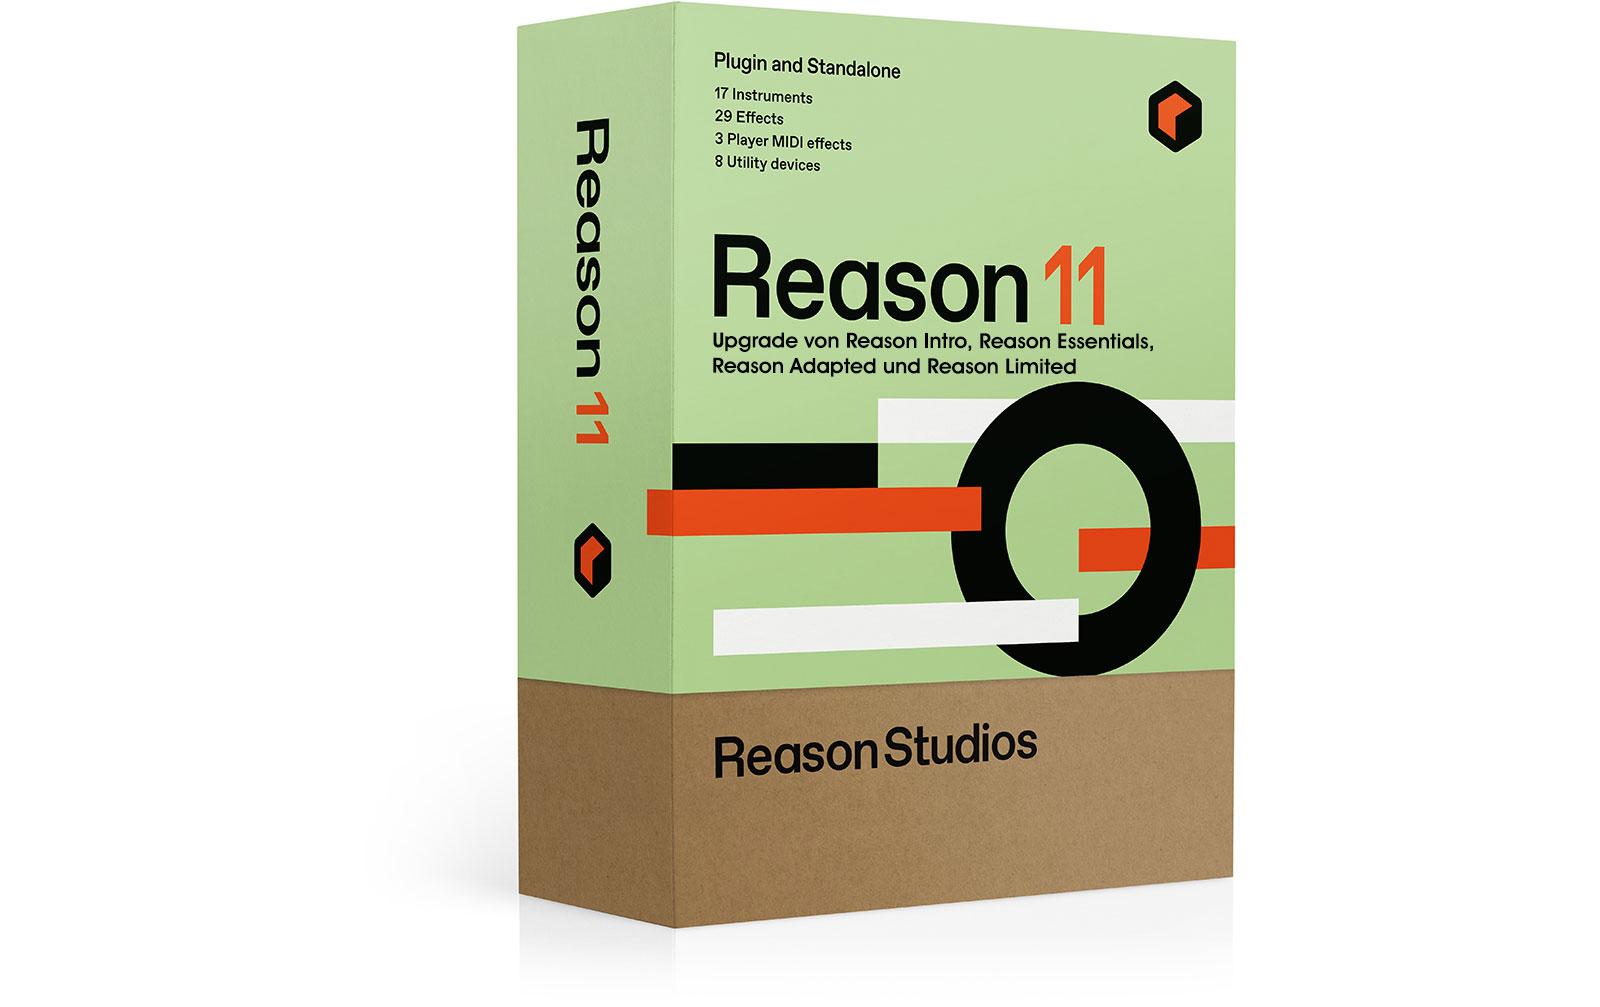 reason-studios-reason-11-upgrade-intro-ltd-ess-box